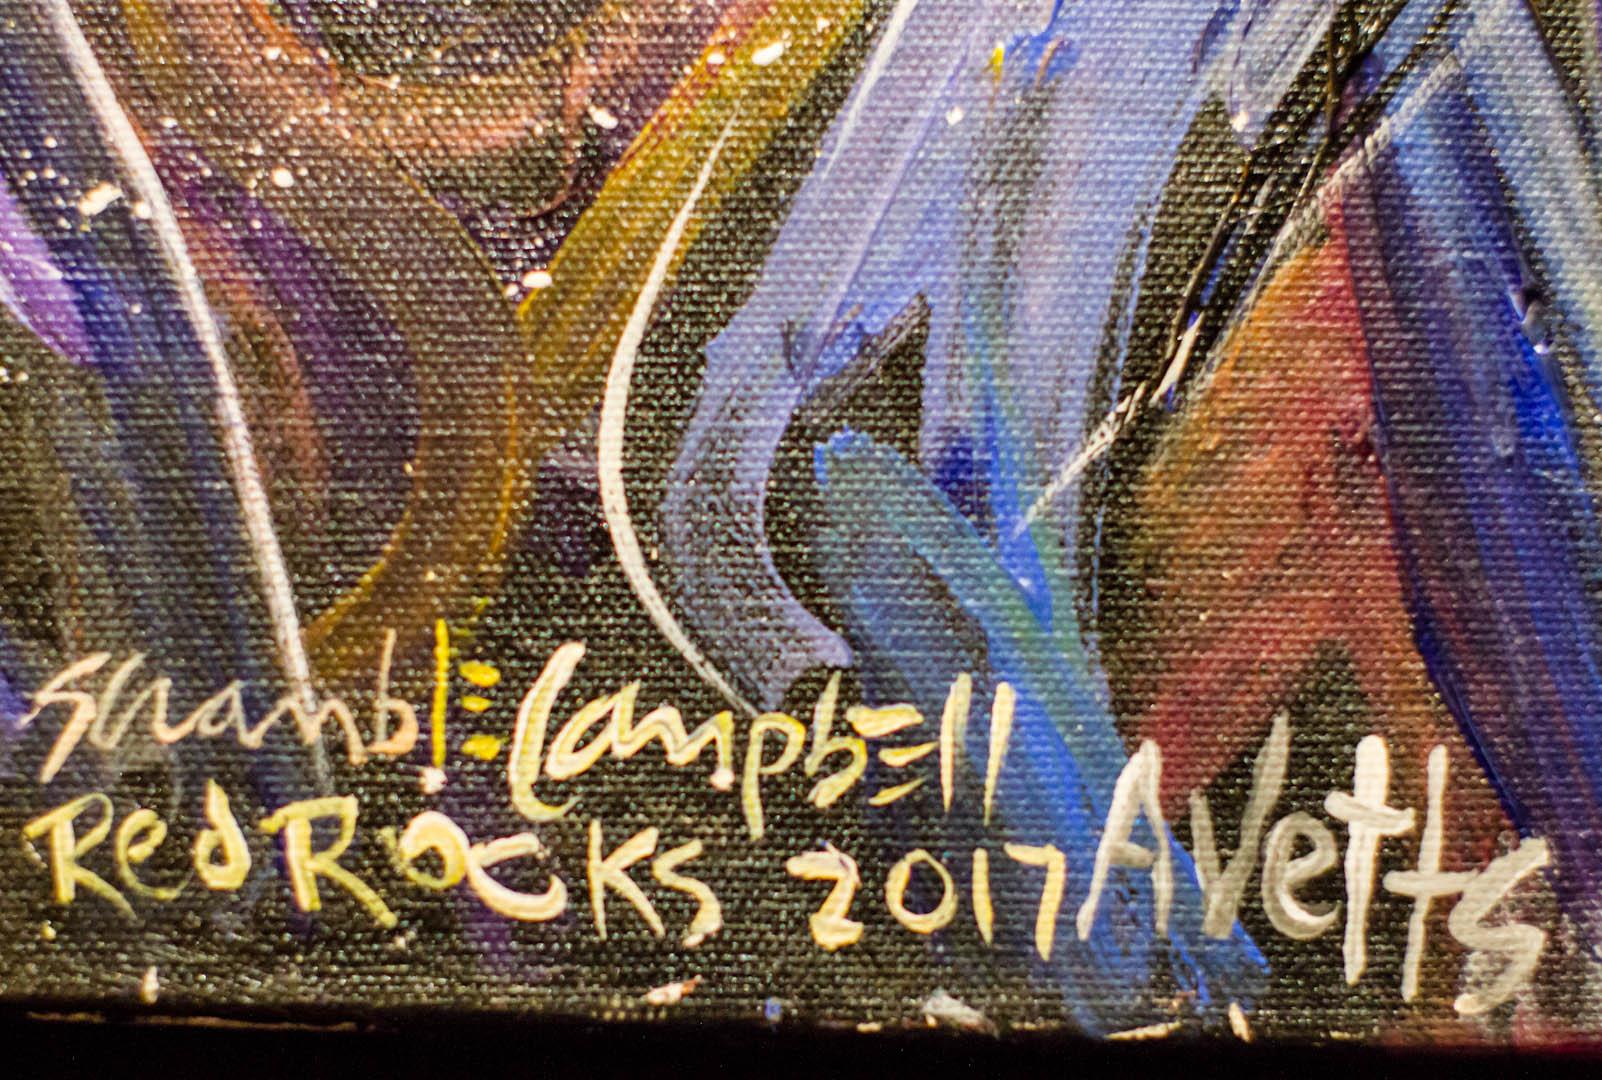 scramblecampbellredrocks-21